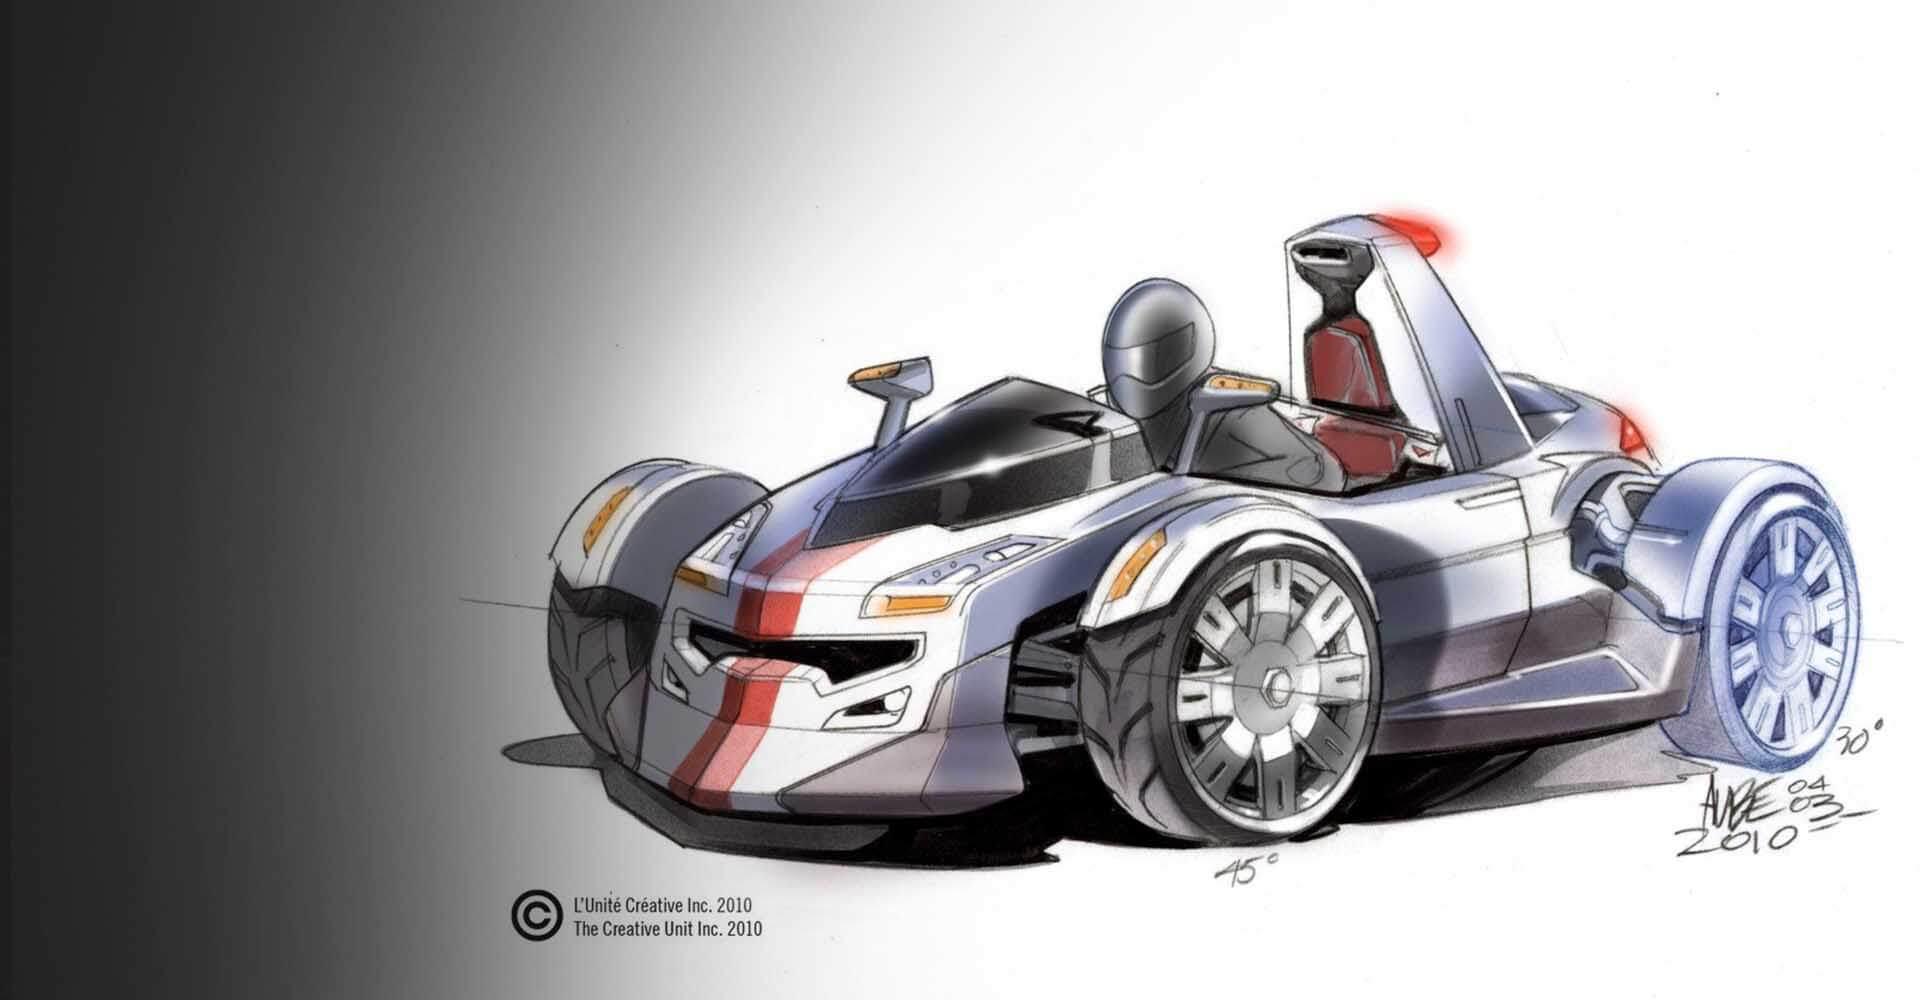 Sketch Motomobile 2010